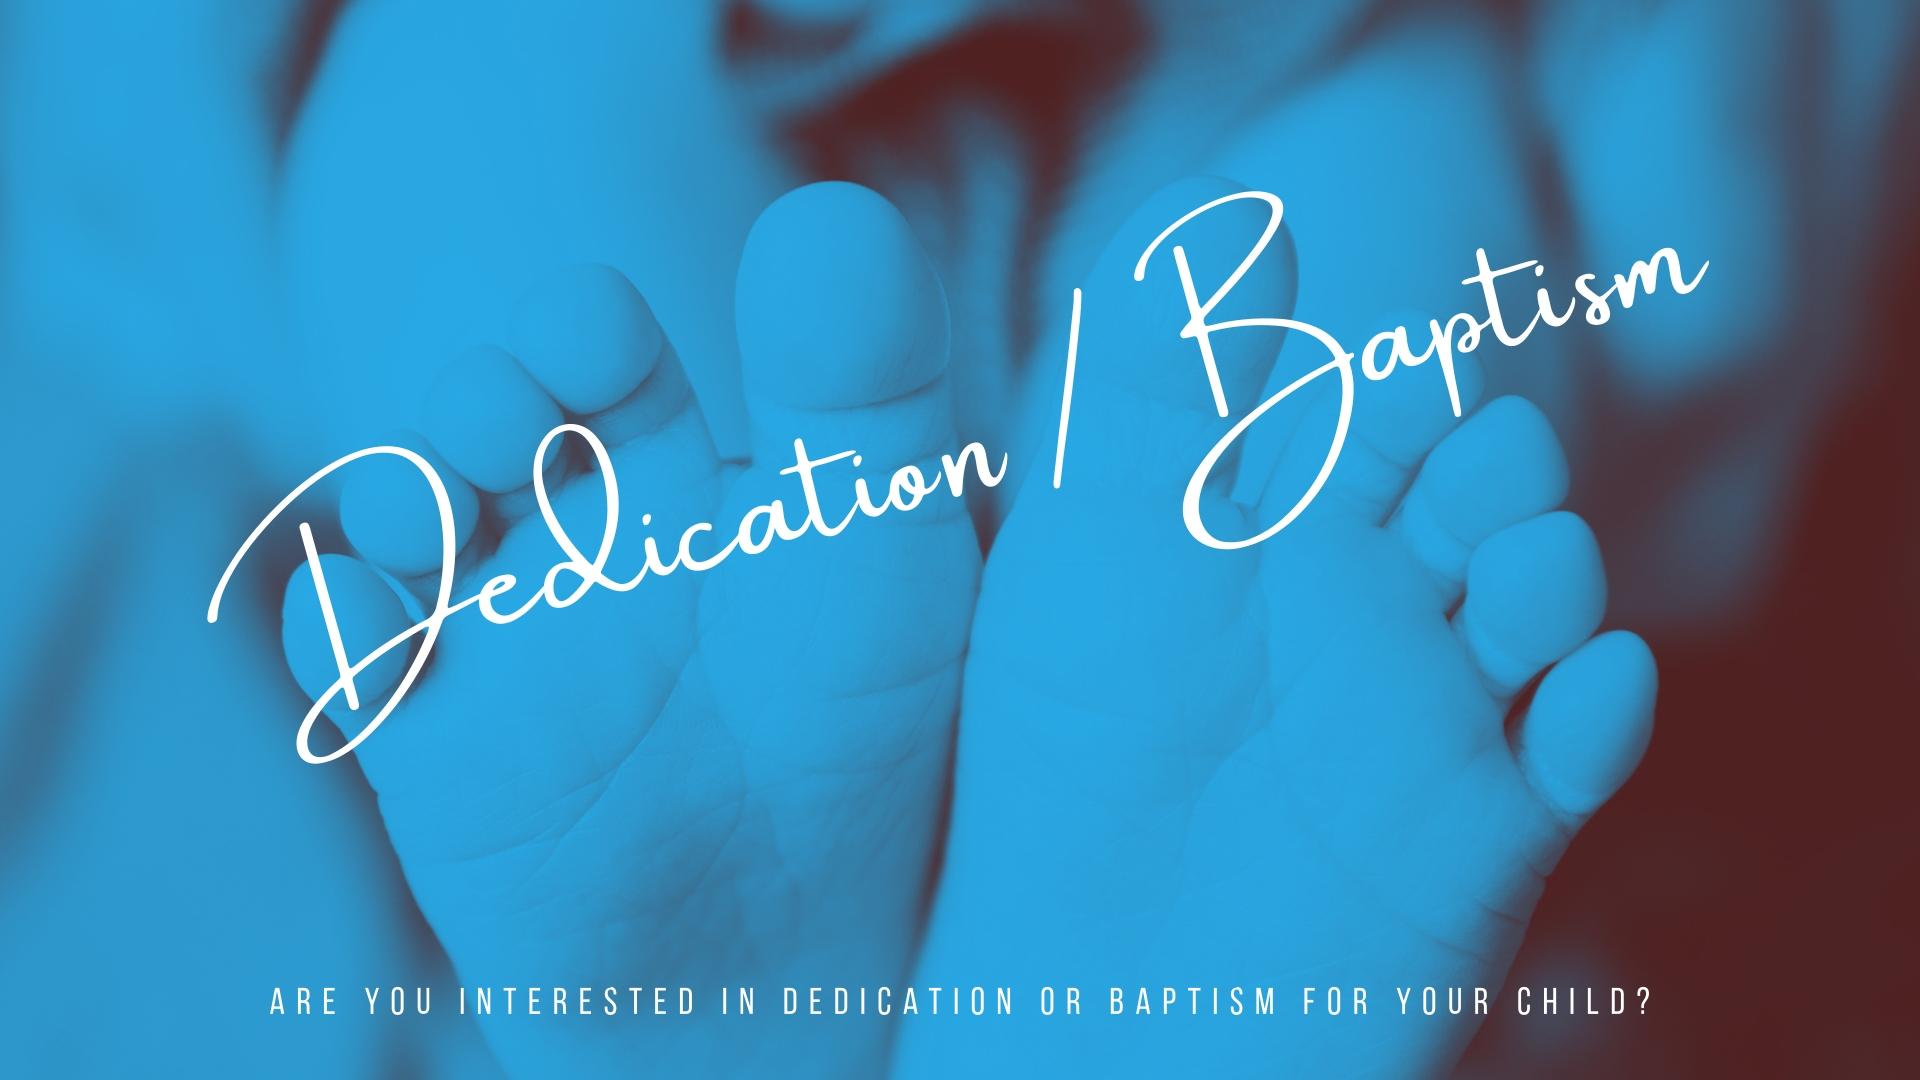 Dedication_baptism.jpg